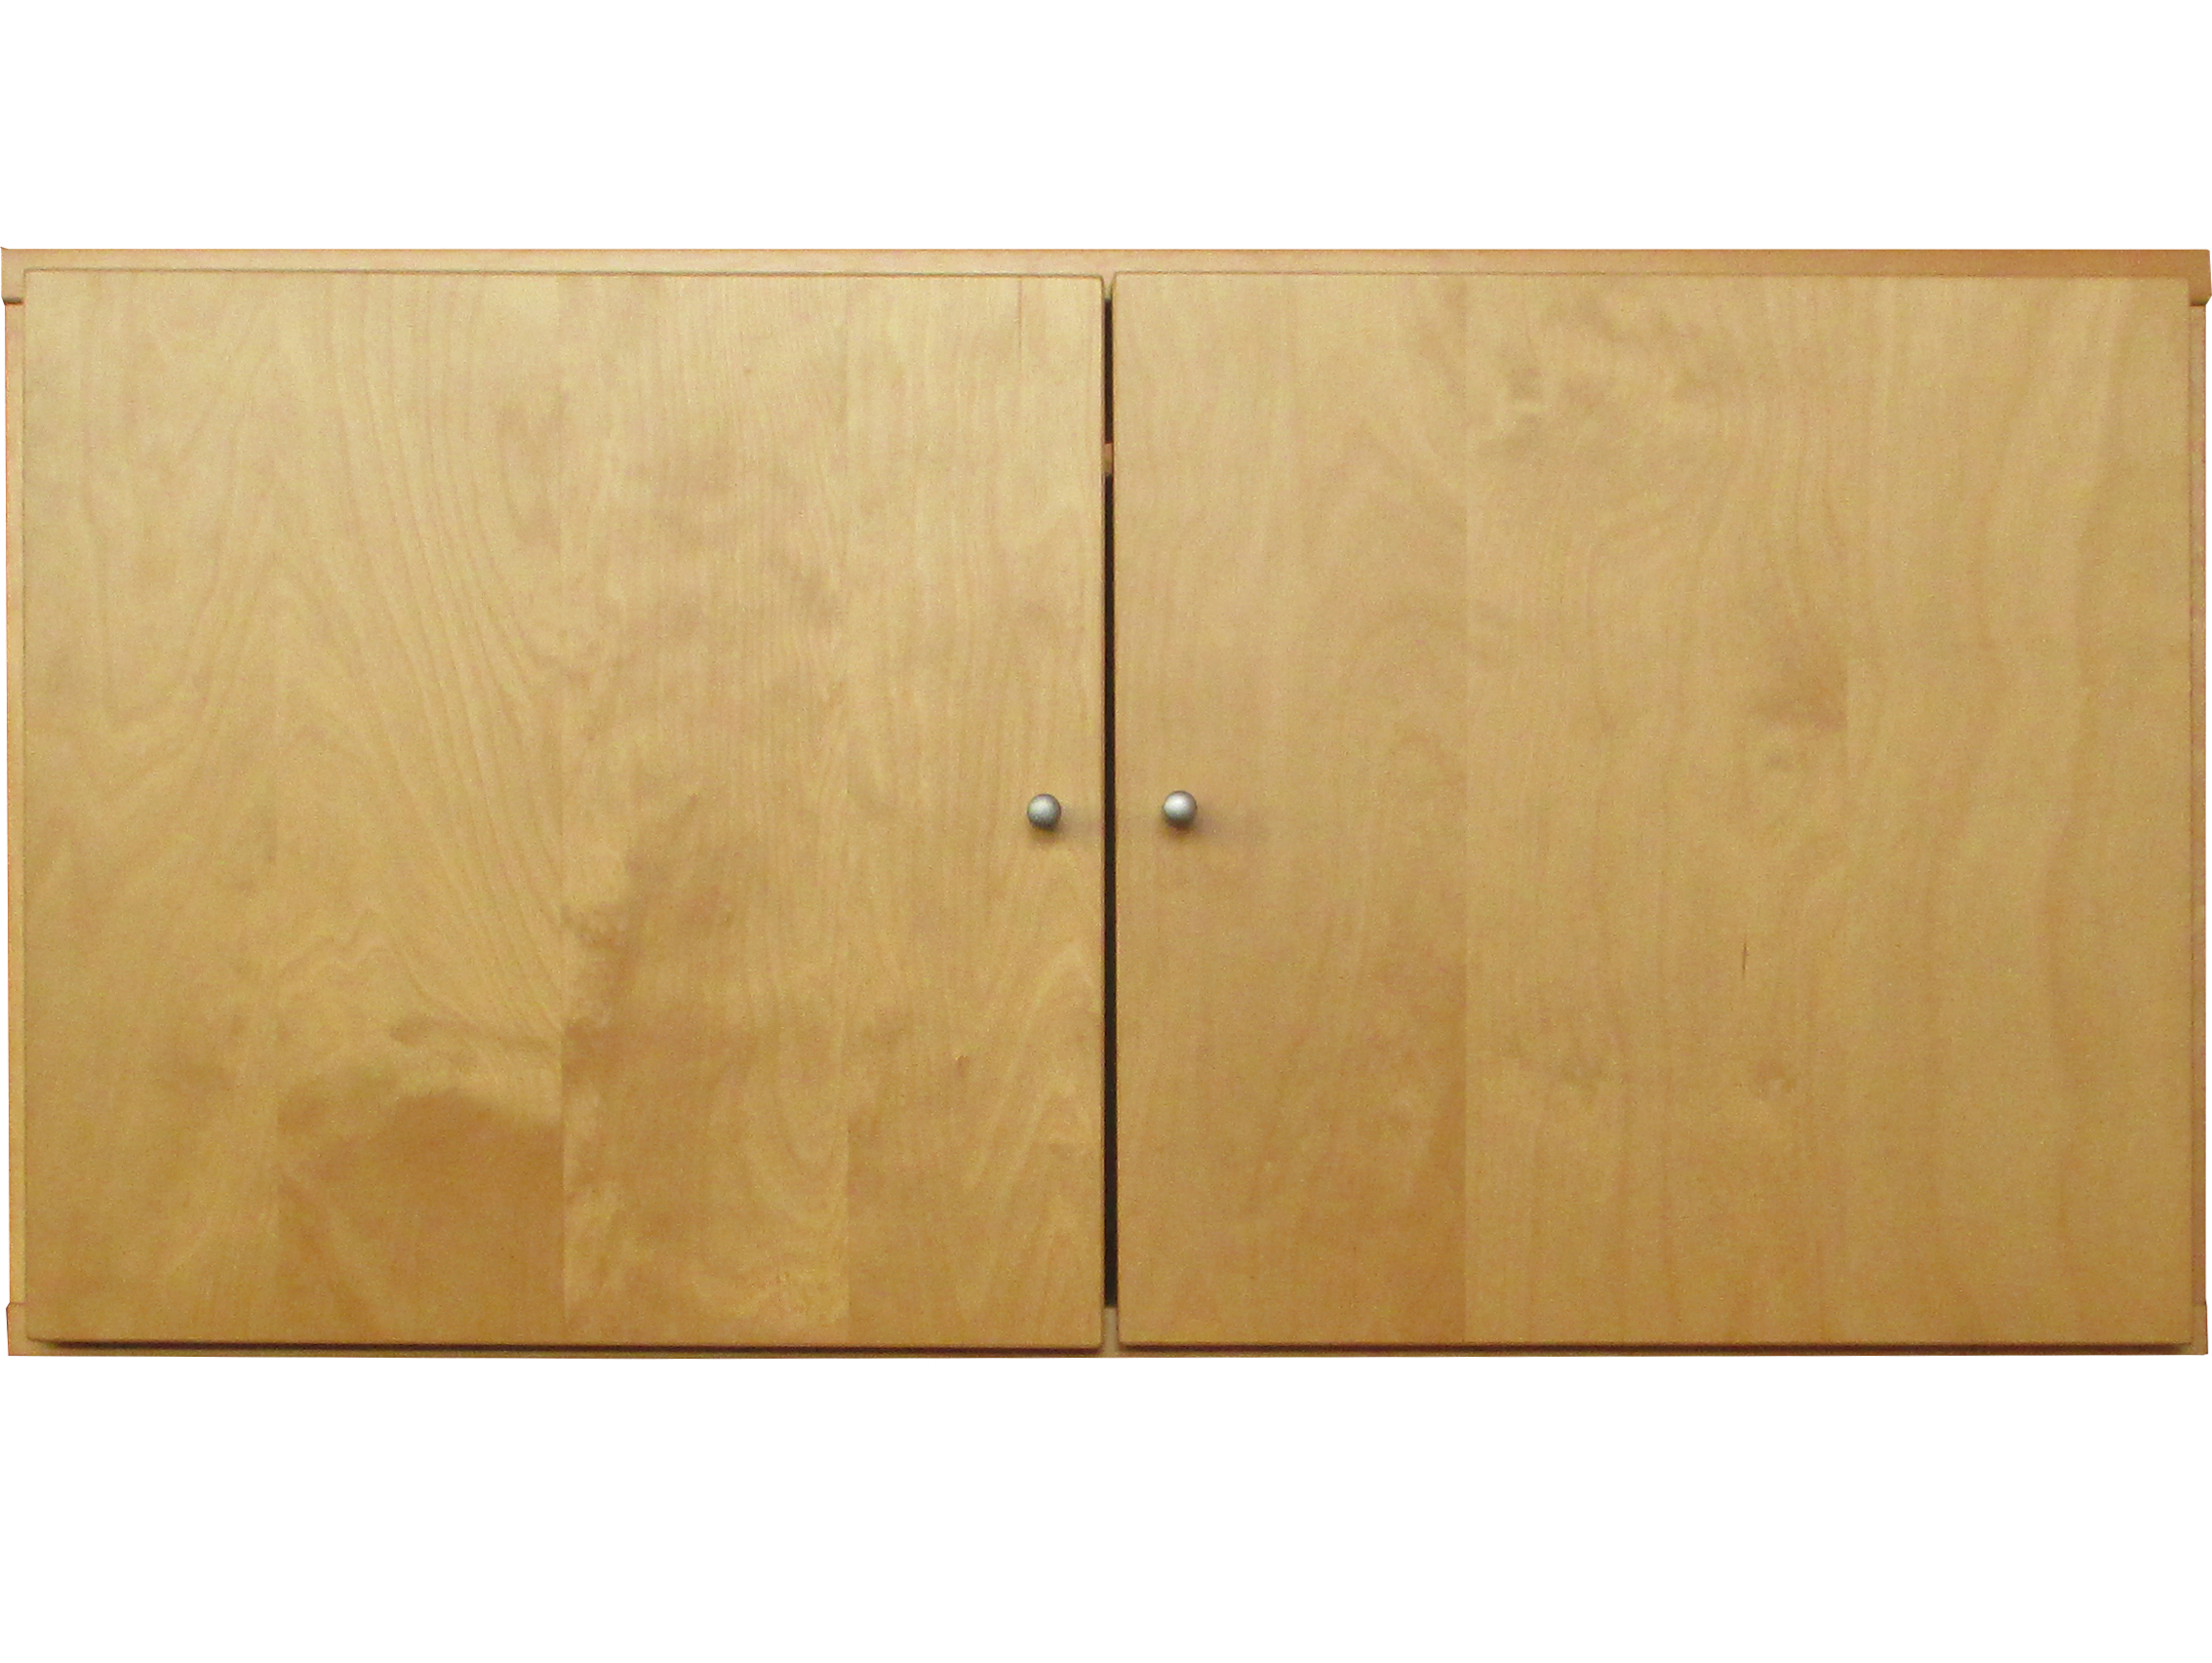 Ikea schrank weiss birke  IKEA Journalist Schrank mit 2 Türen in Birke 500.745.31-50074531